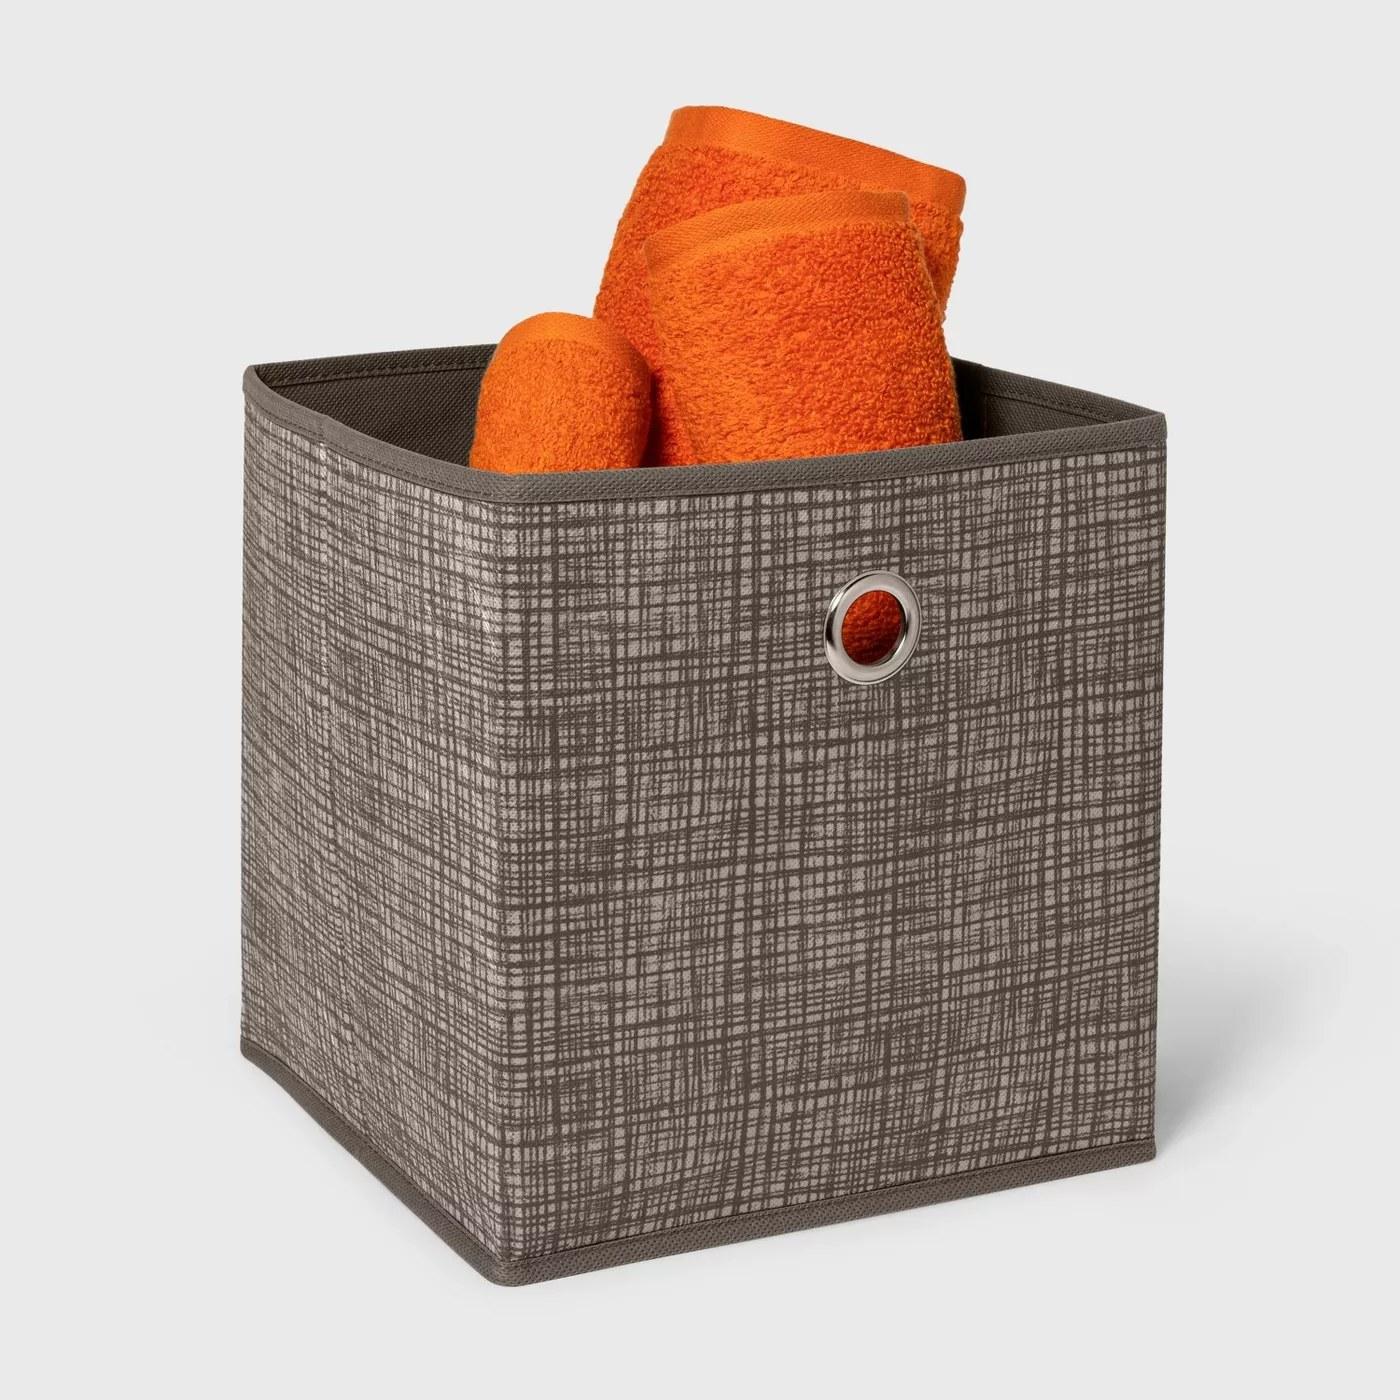 A fabric storage bin